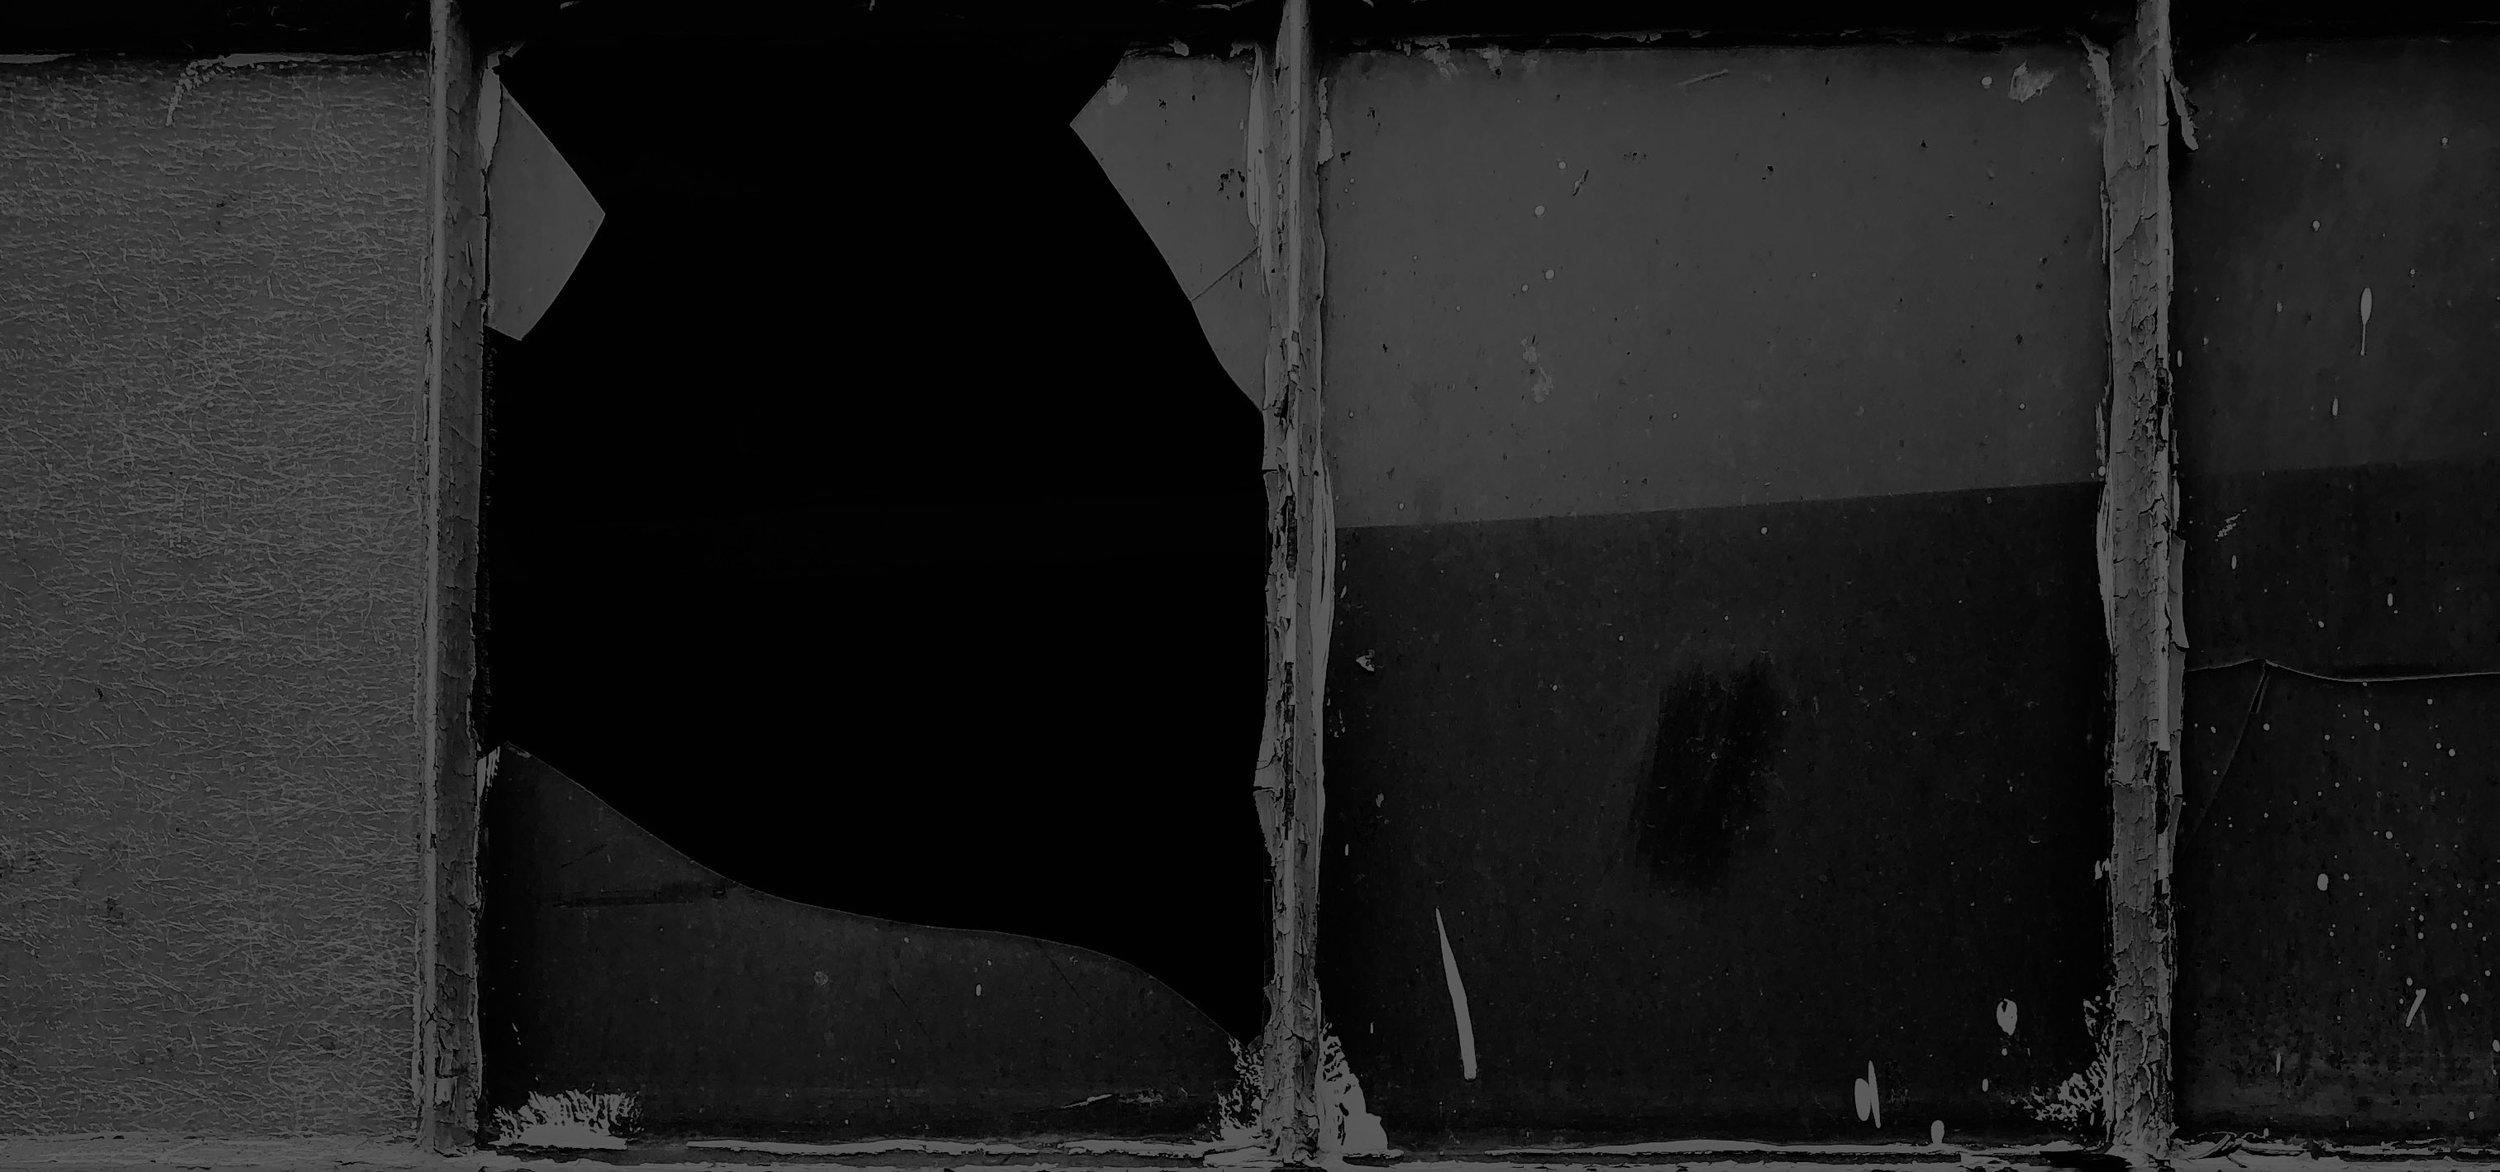 BROKEN WINDOW THEORY -